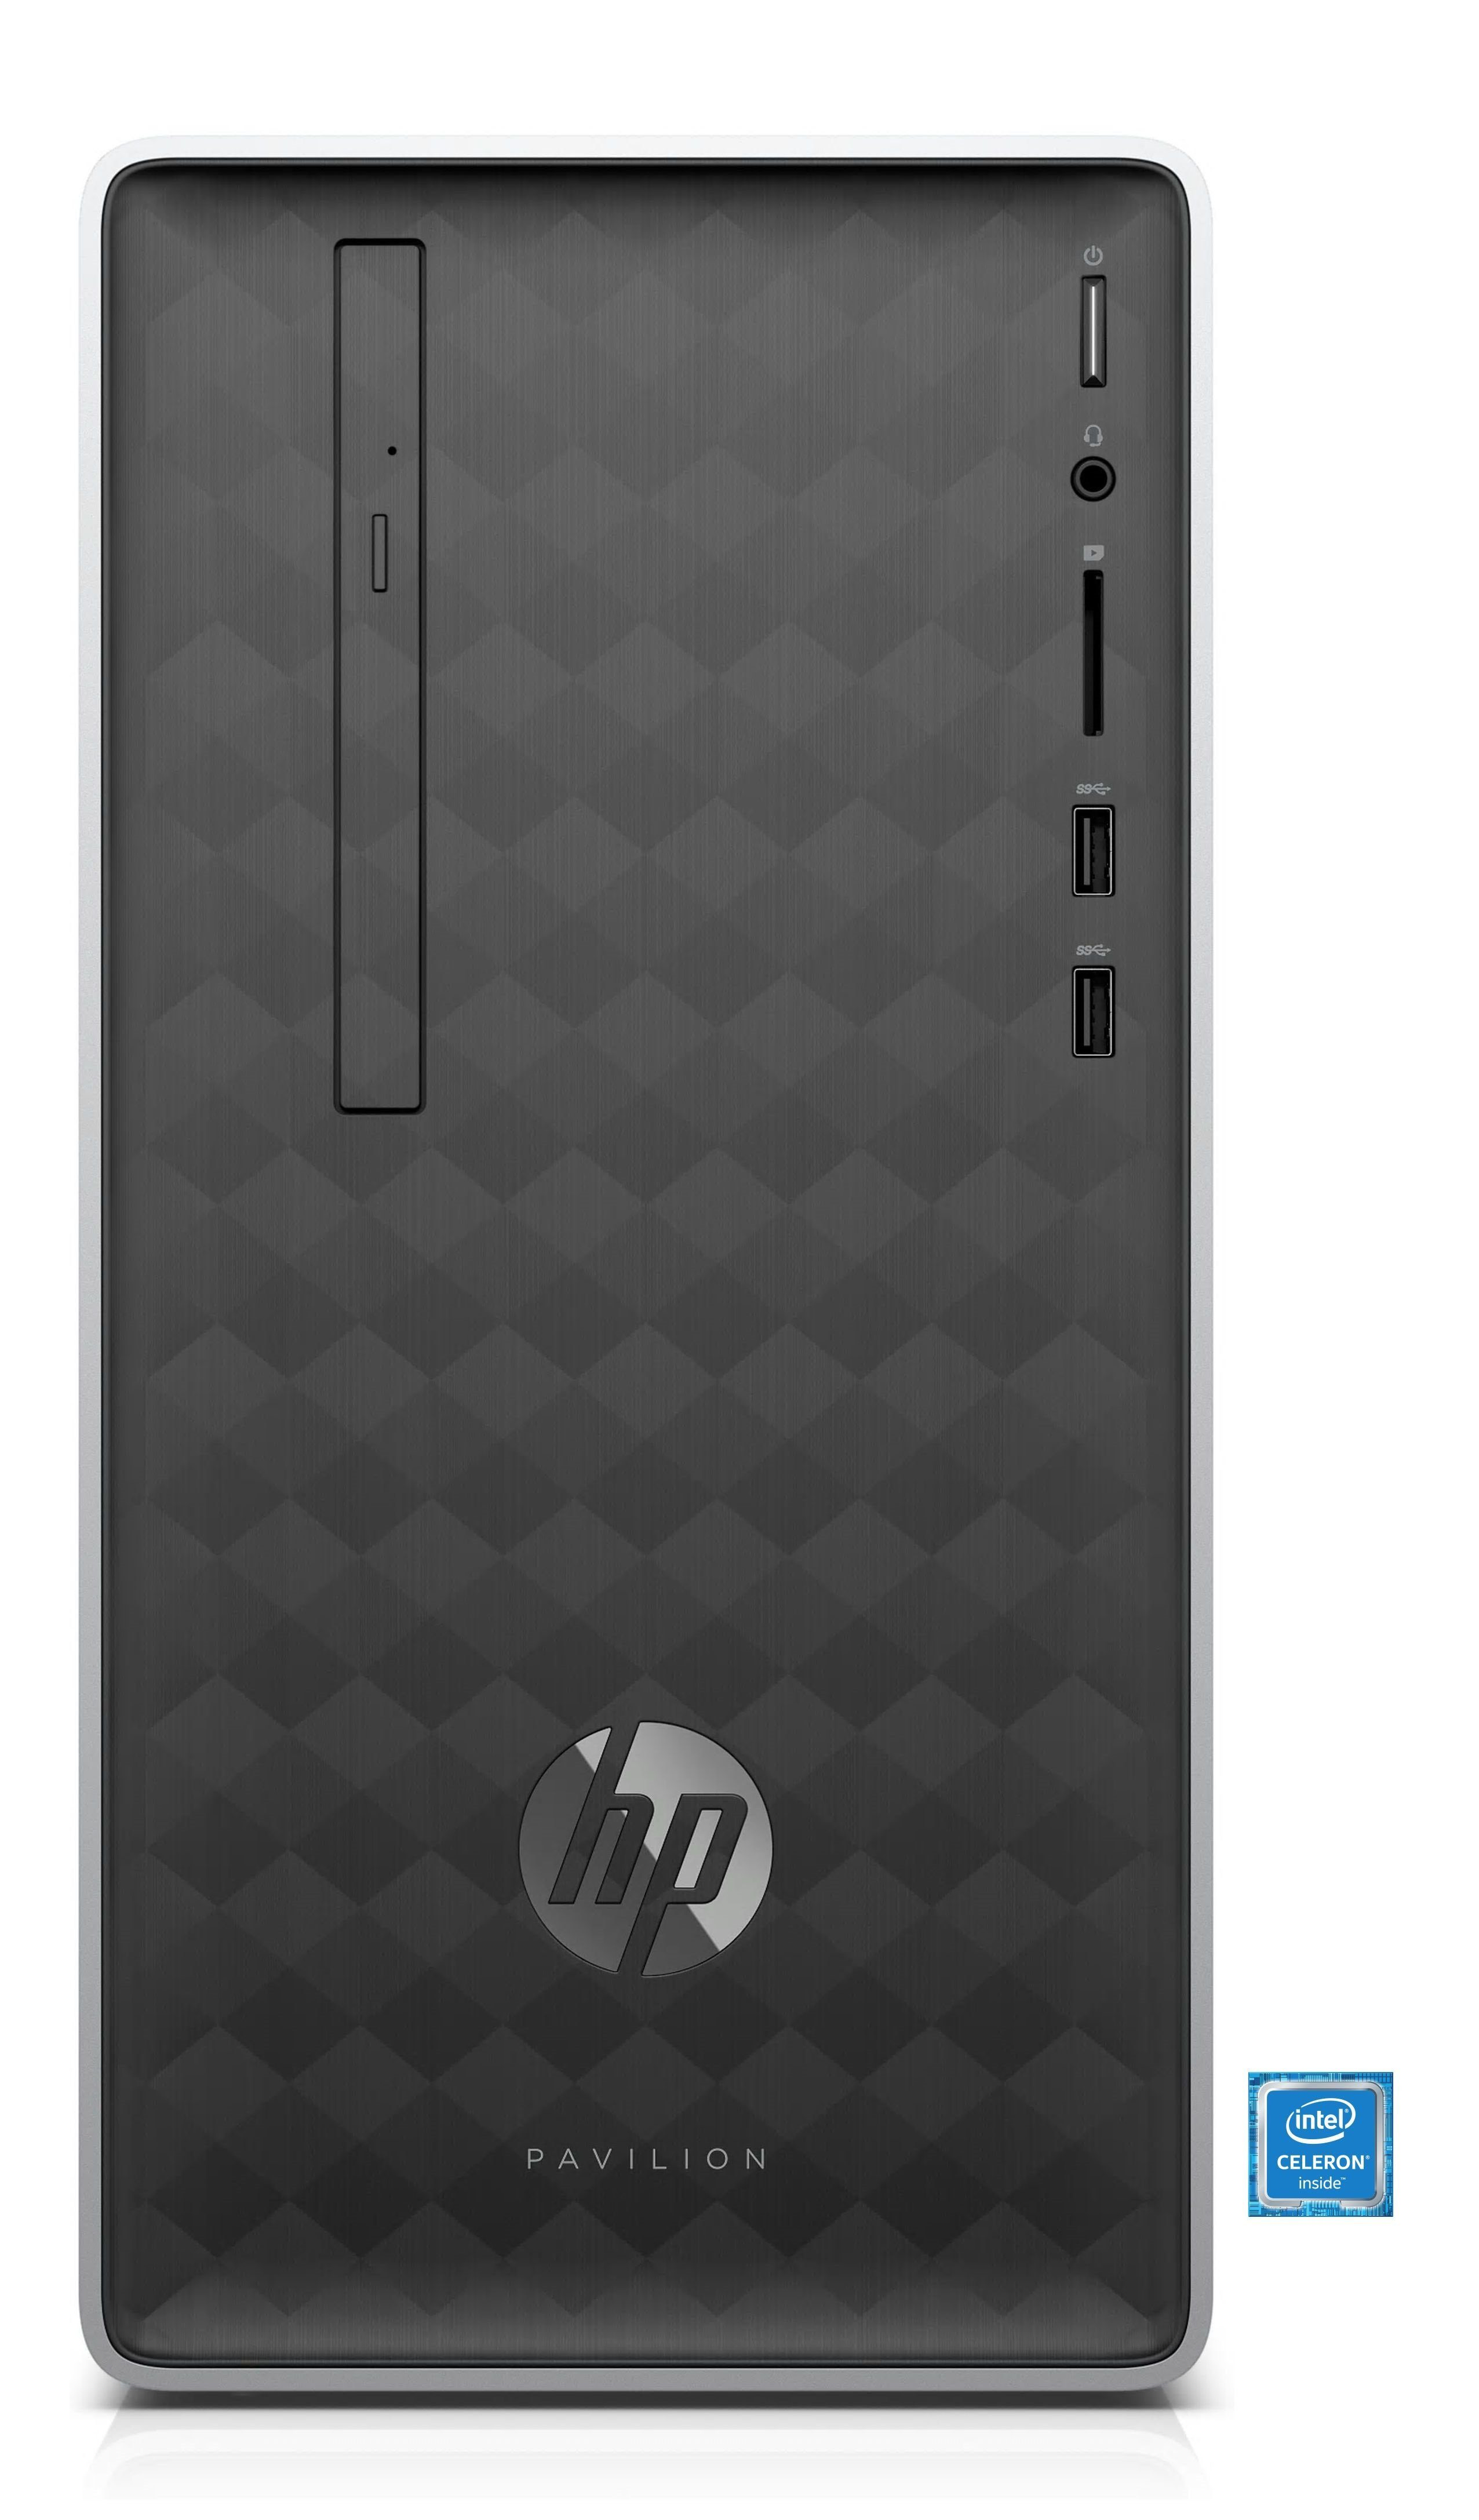 HP Pavilion 590-a0506ng Desktop PC »Intel Celeron J4005, Intel Graphics, 256 SSD, 8GB«